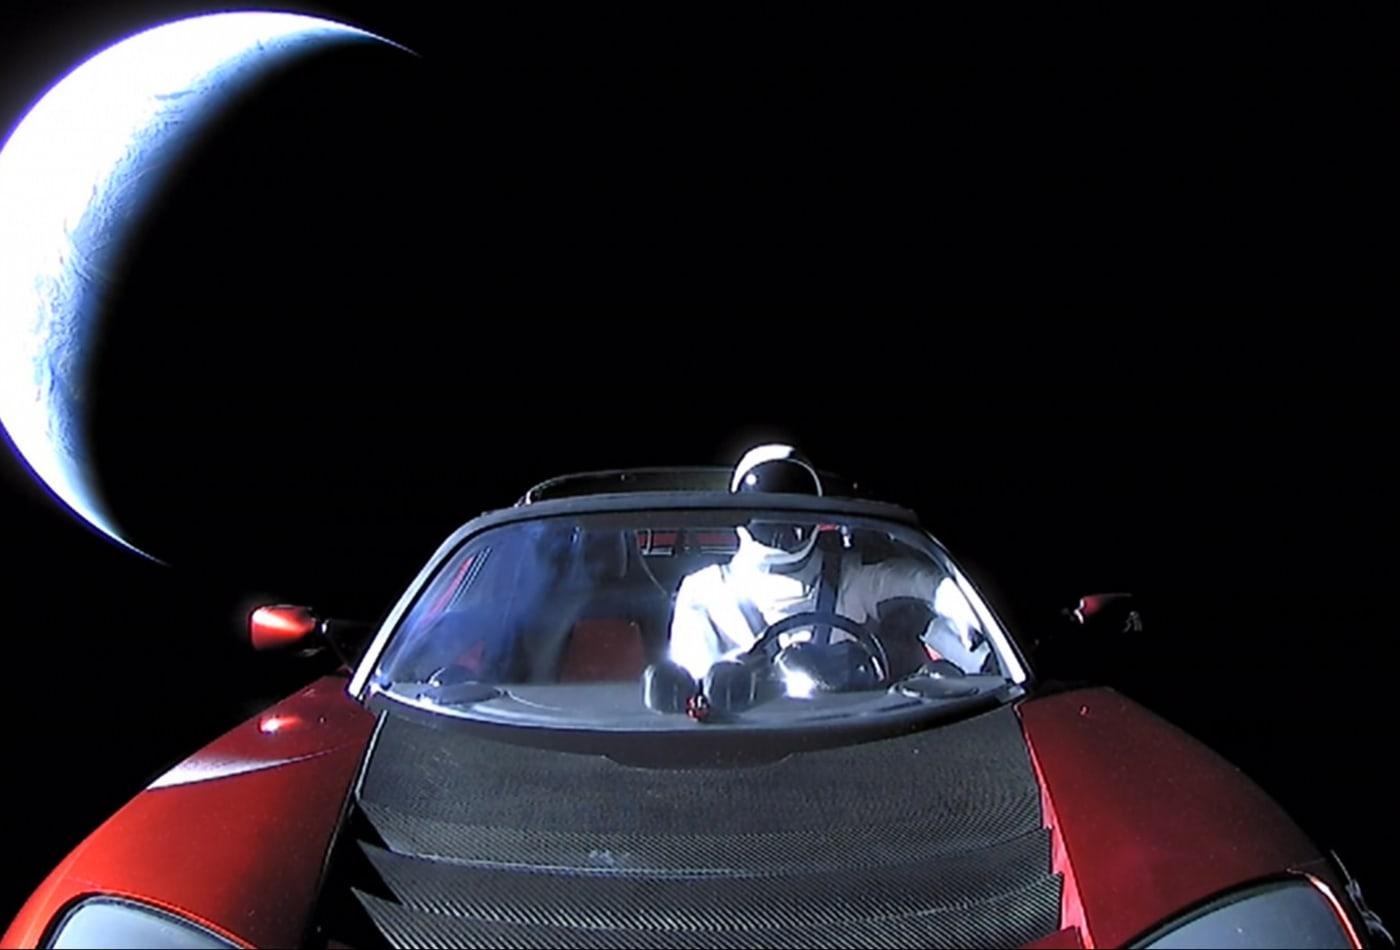 Elon Musk Roadster in Space.jpg